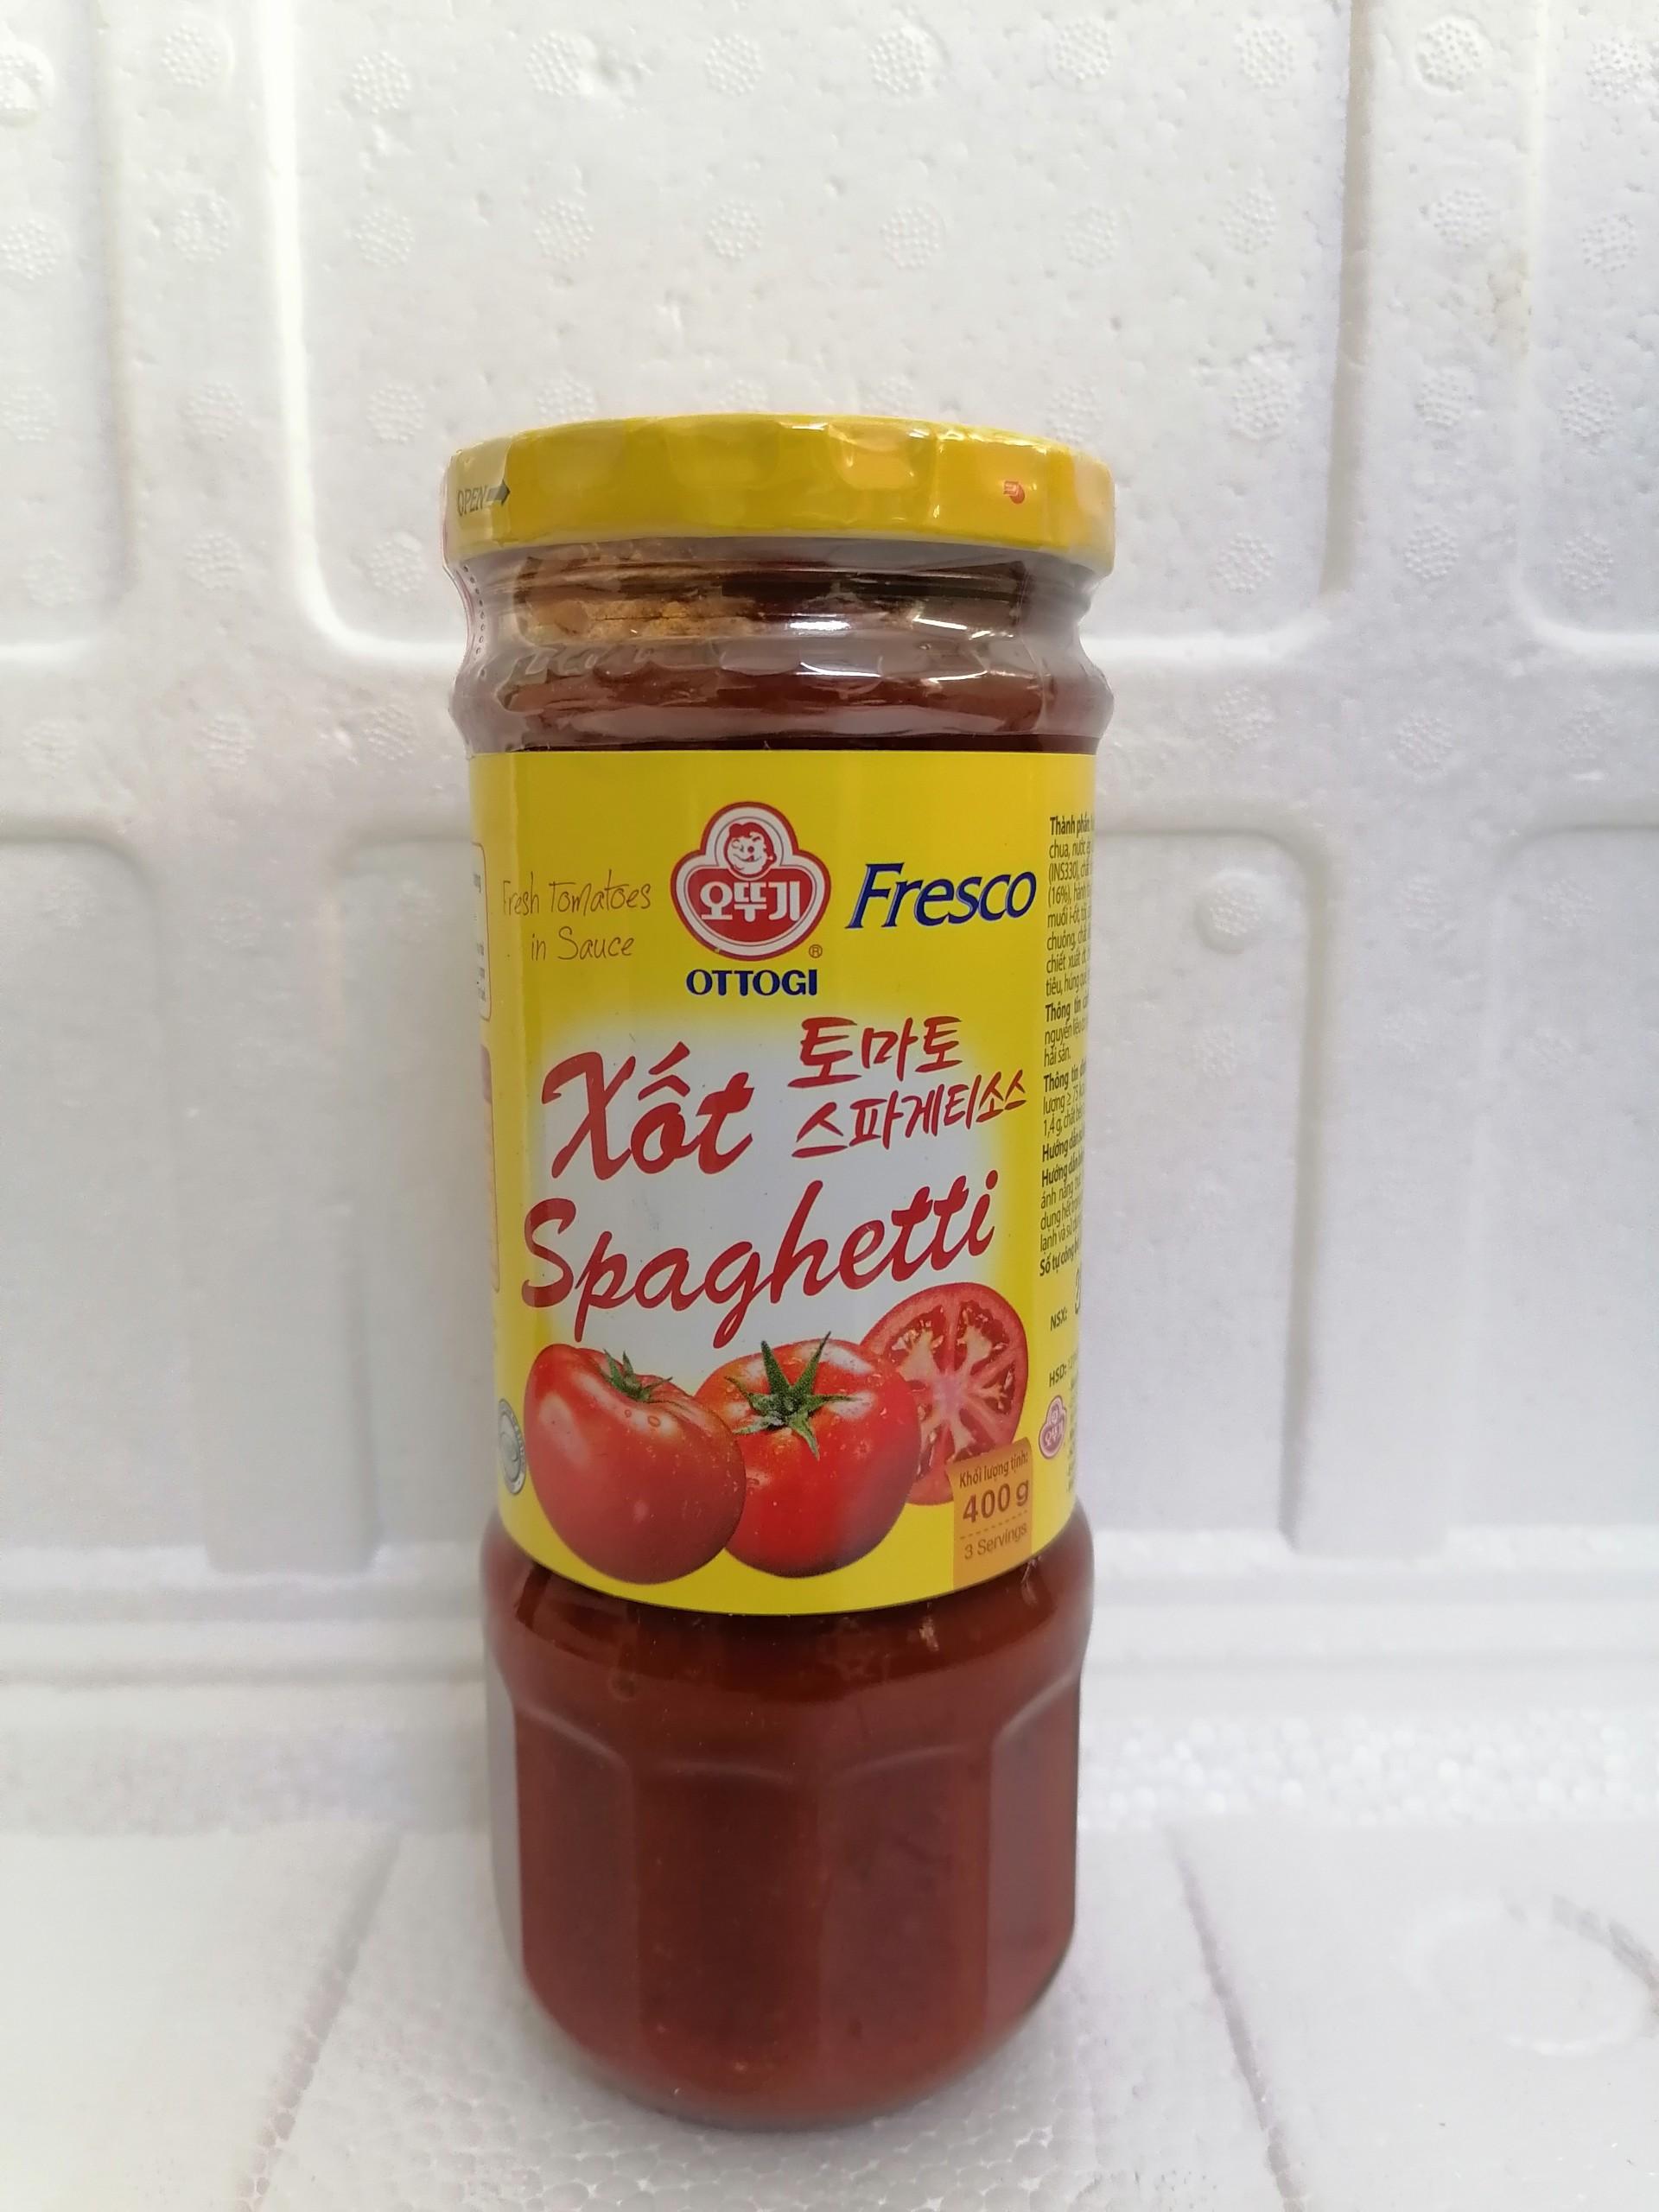 [400g] Xốt mì Ý cà chua [VN] OTTOGI Fresco Tomato Spaghetti Sauce